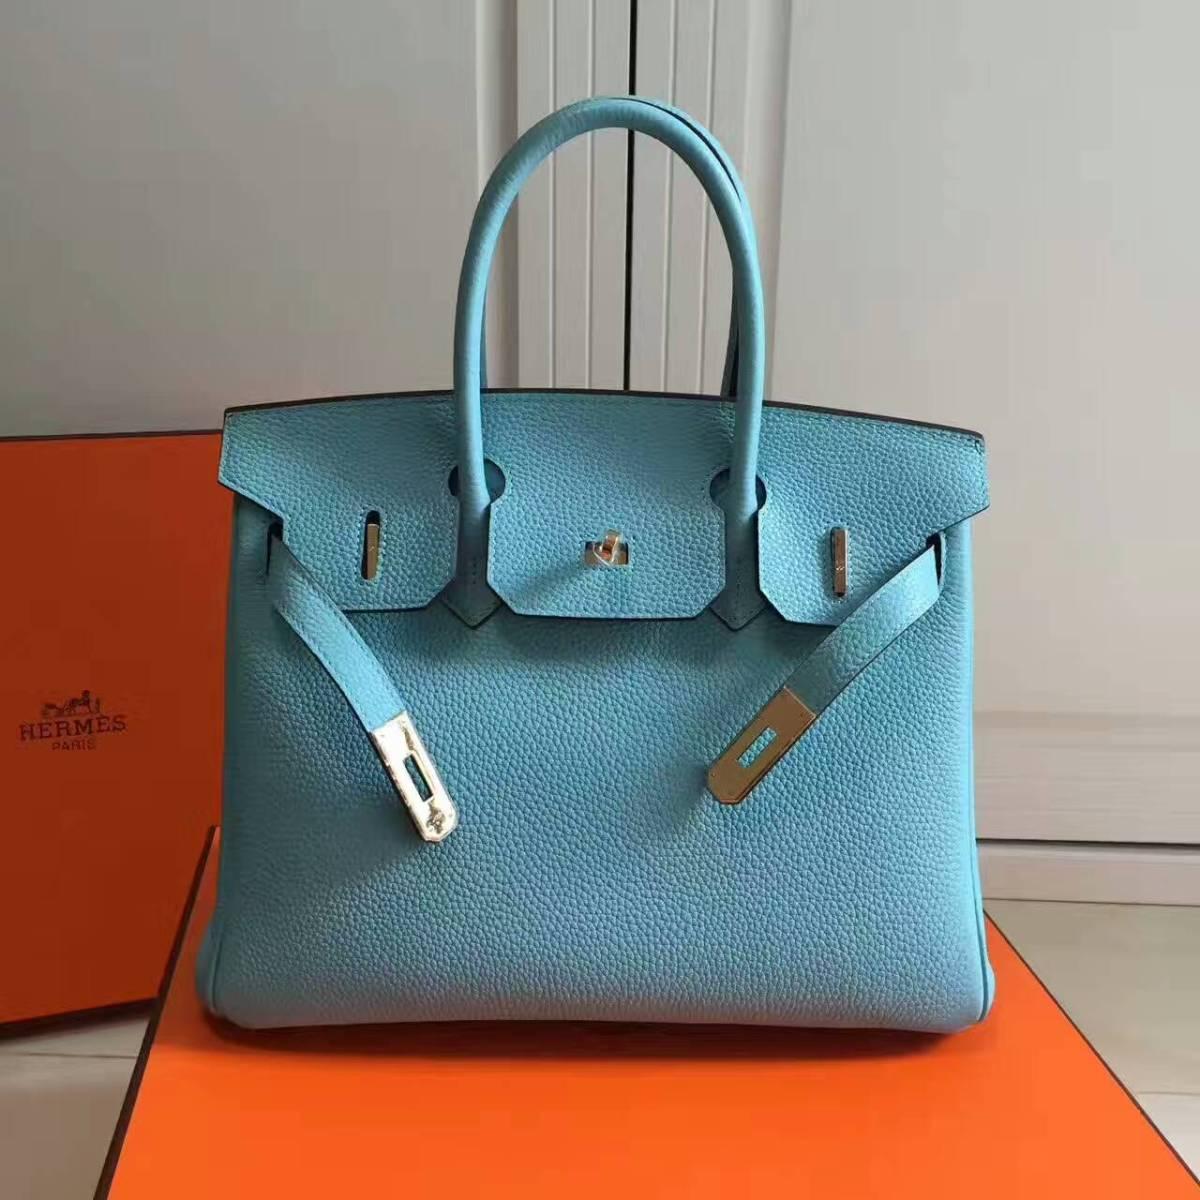 Hermes Birkin 25cm Original Togo leatherbag